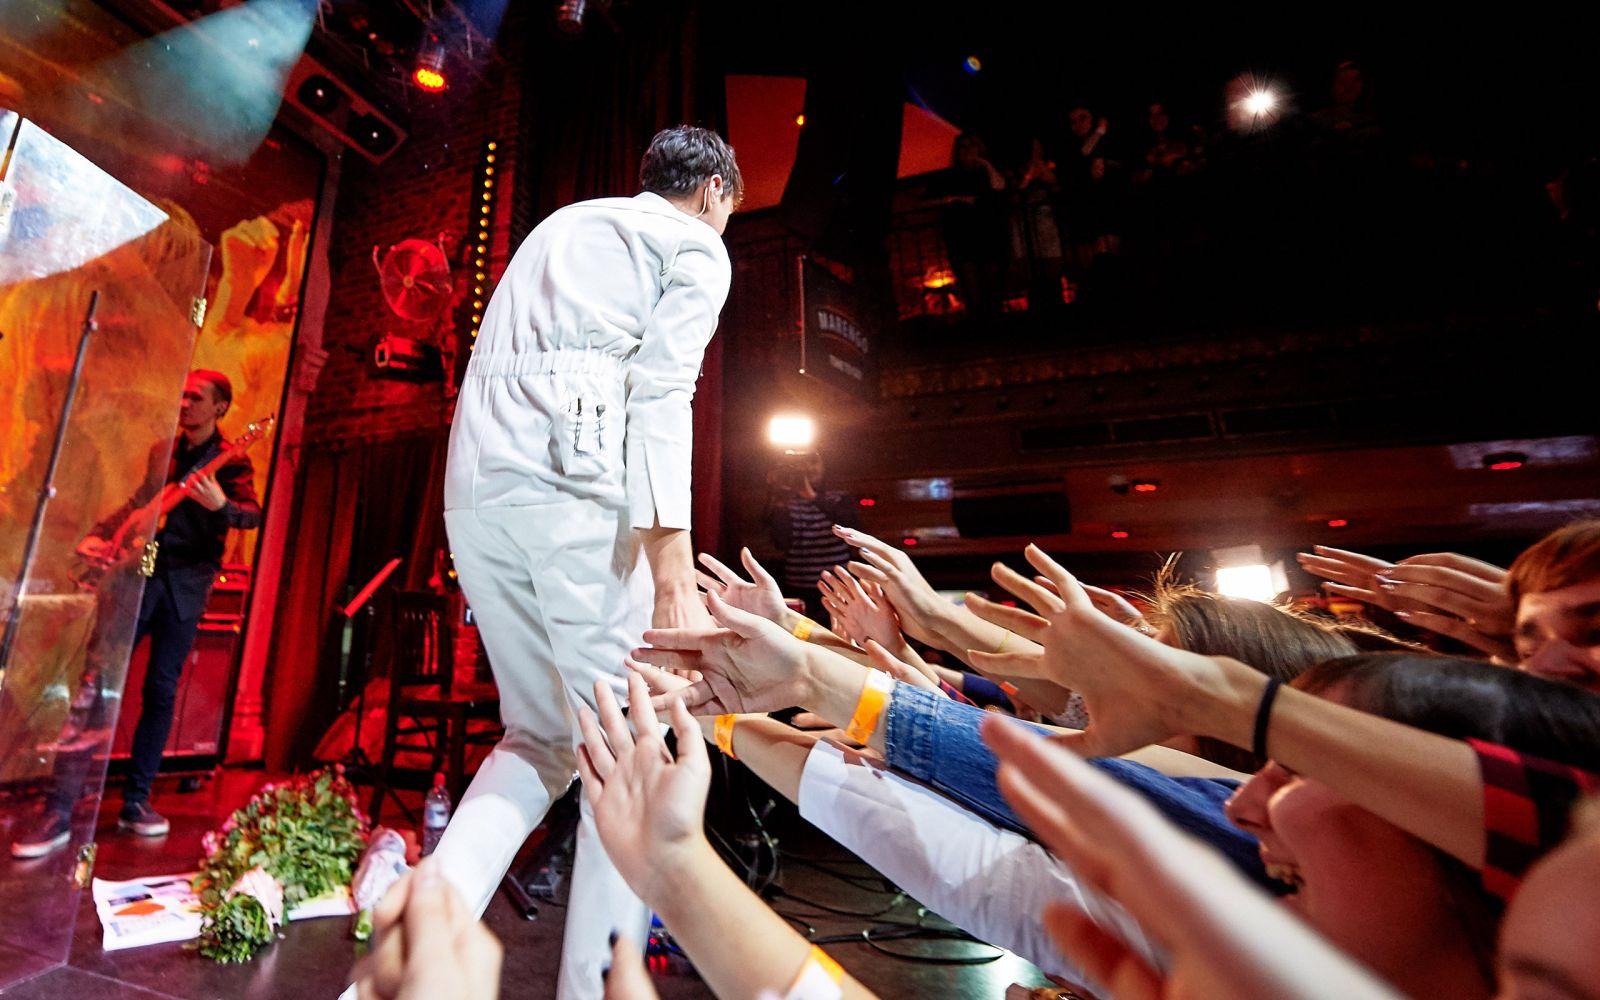 Опьяненные талантом: Alekseev взорвал публику своим первым альбомом Alekseev,Alekseev фото,Алексеев,Алексеев фото